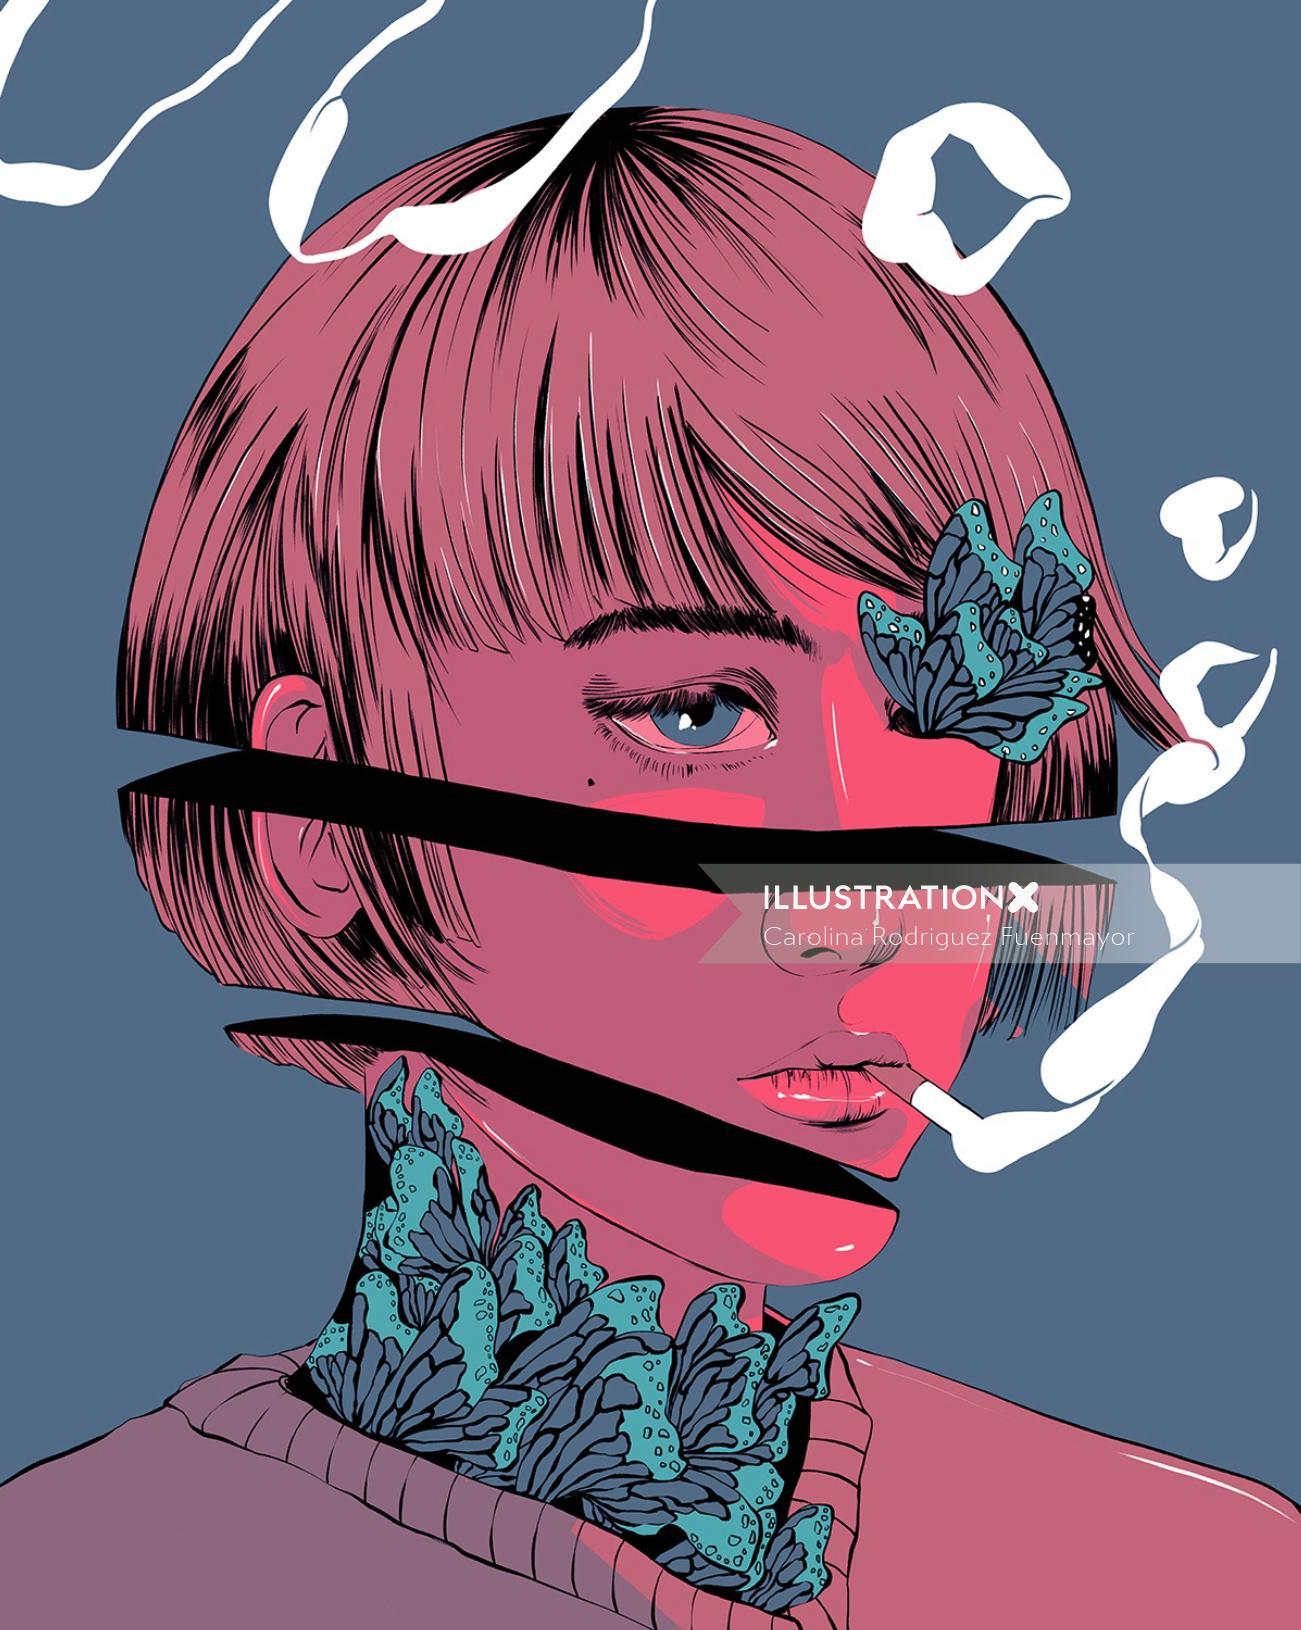 Digital illustration of smoking girl